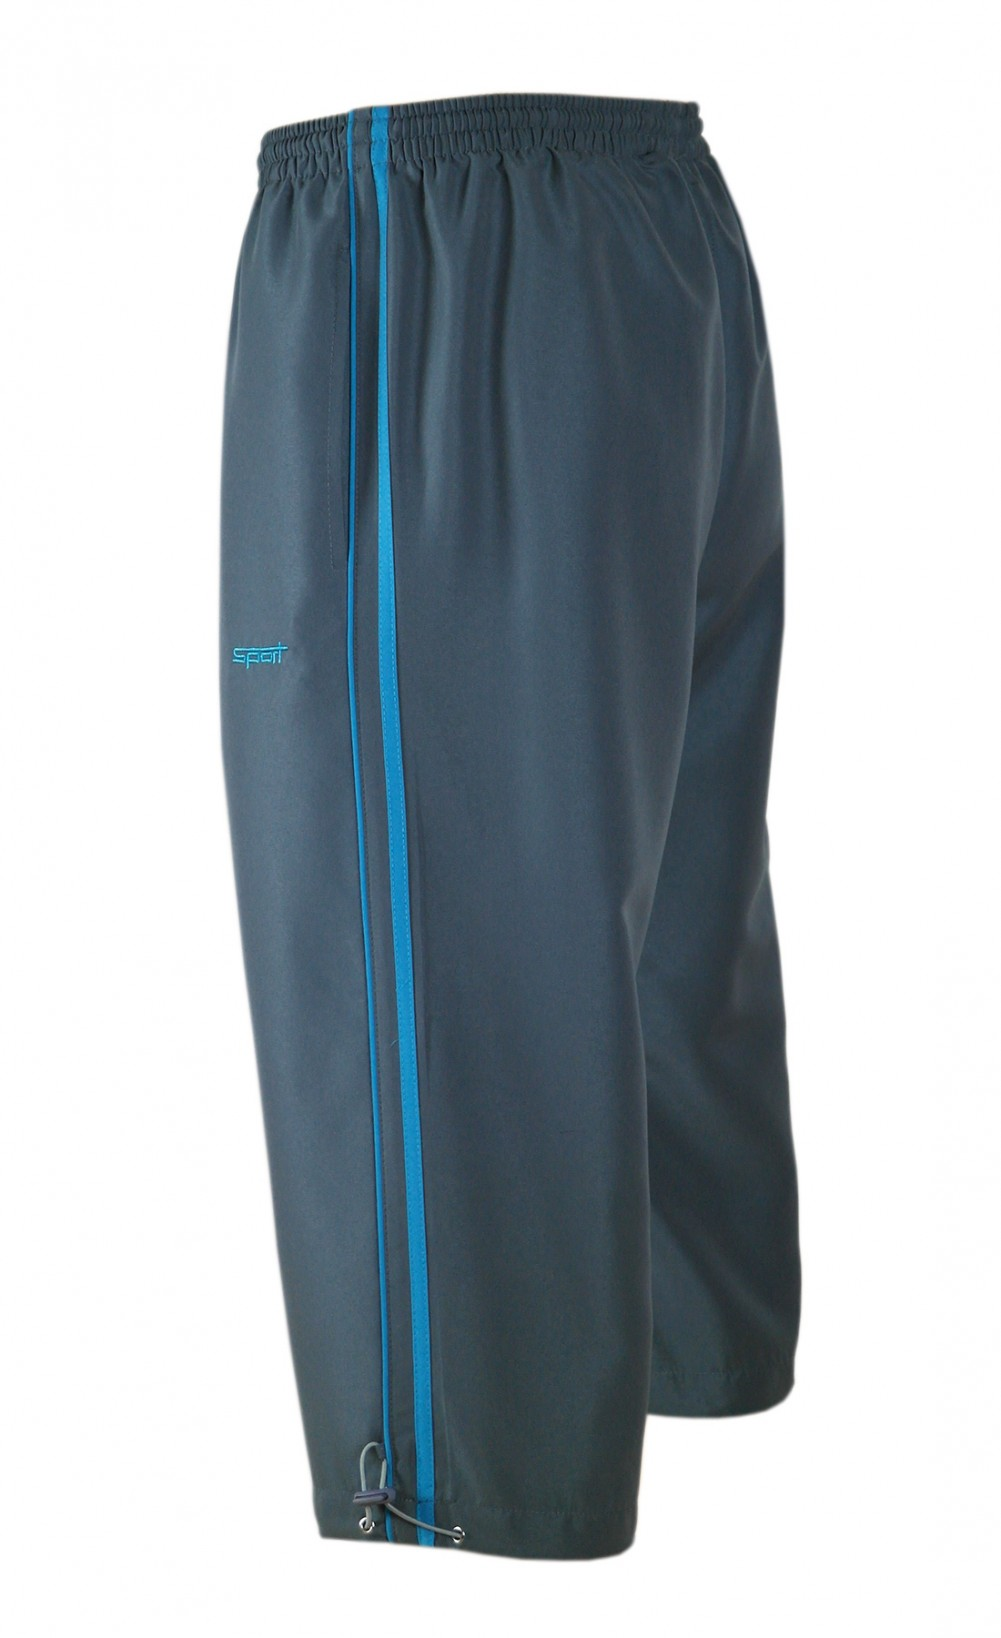 Microfaser 3/4 Hose - Bermudas Shorts Herren - Grau